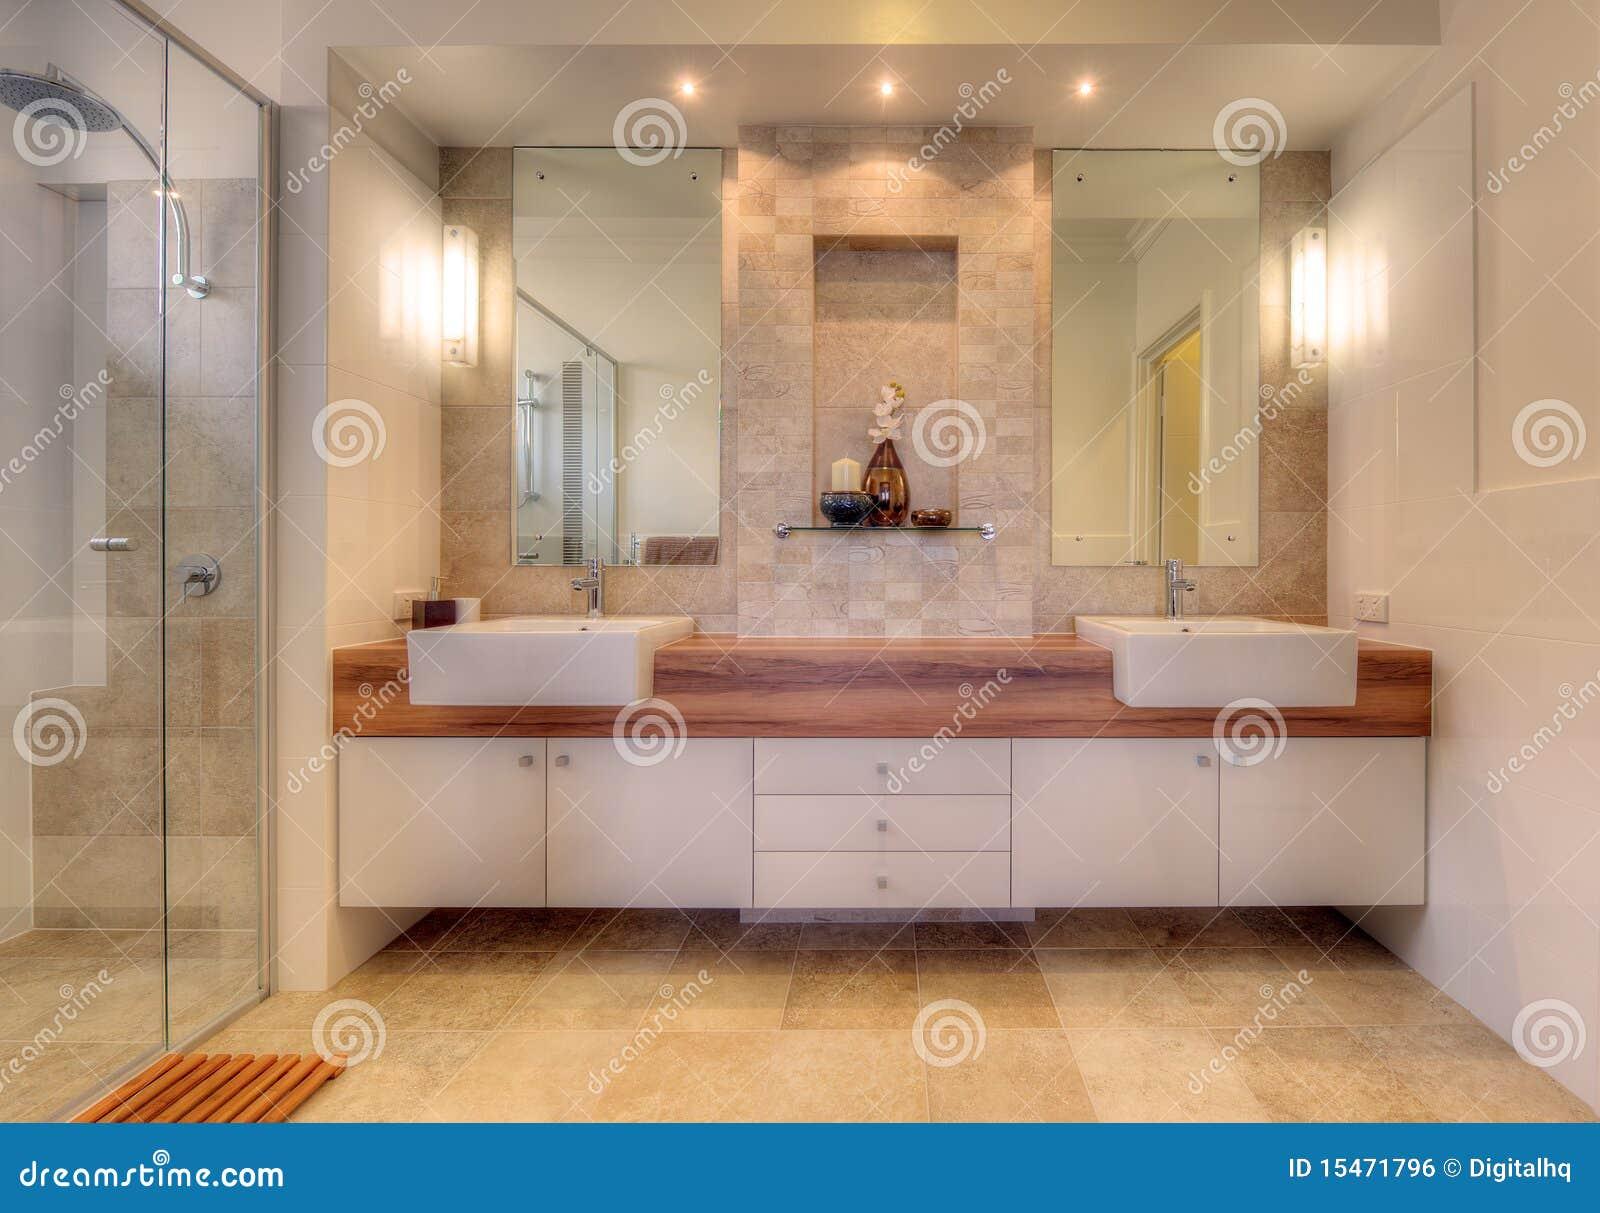 amazing baos modernos de lujocuarto de bao de lujo en hogar moderno imagen de archivo libre de baos modernos de lujo with cuartos bao modernos with fotos - Imagenes De Cuartos De Bao